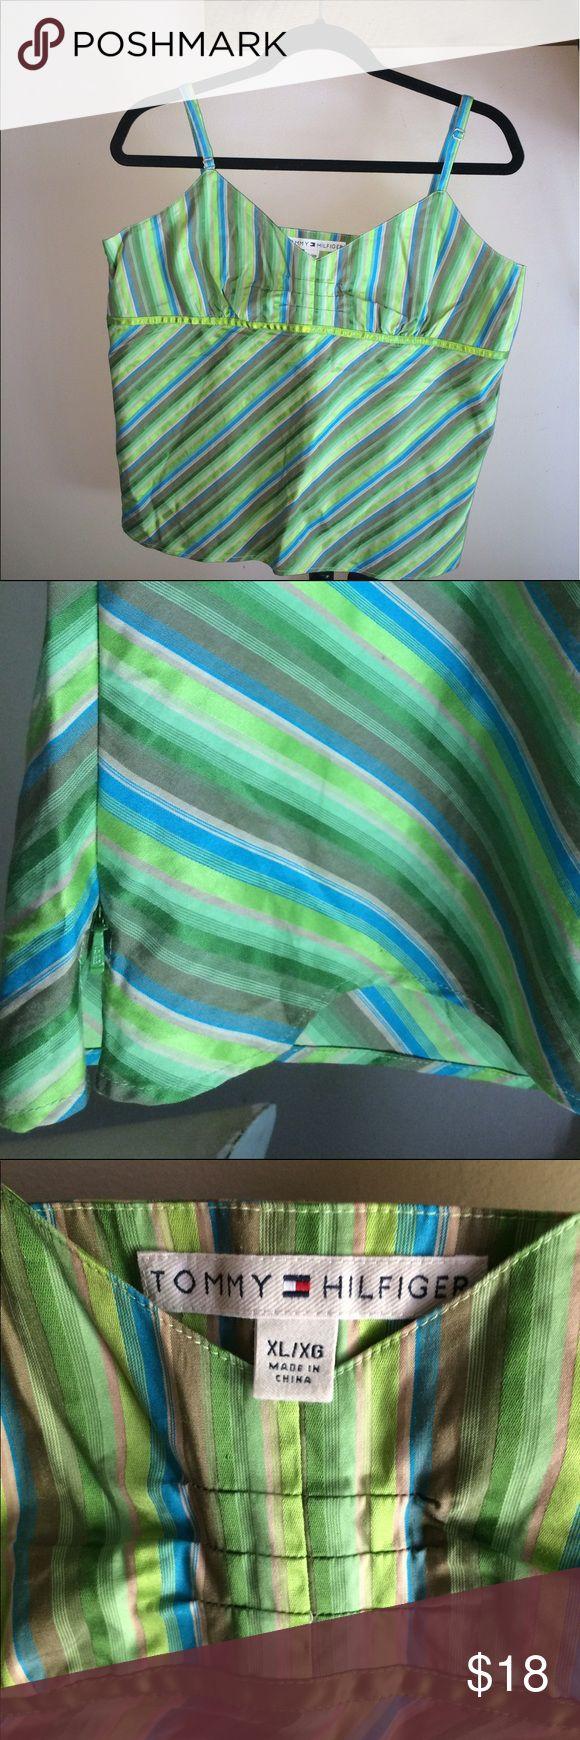 Tommy Hilfiger-Green Cami w/Blue Stripe 🆓B2G1🆓 Tommy Hilfiger-Green Cami w/Blue Diagonal Stripe.                           EUC.                           Measurements: Tommy Hilfiger Tops Camisoles